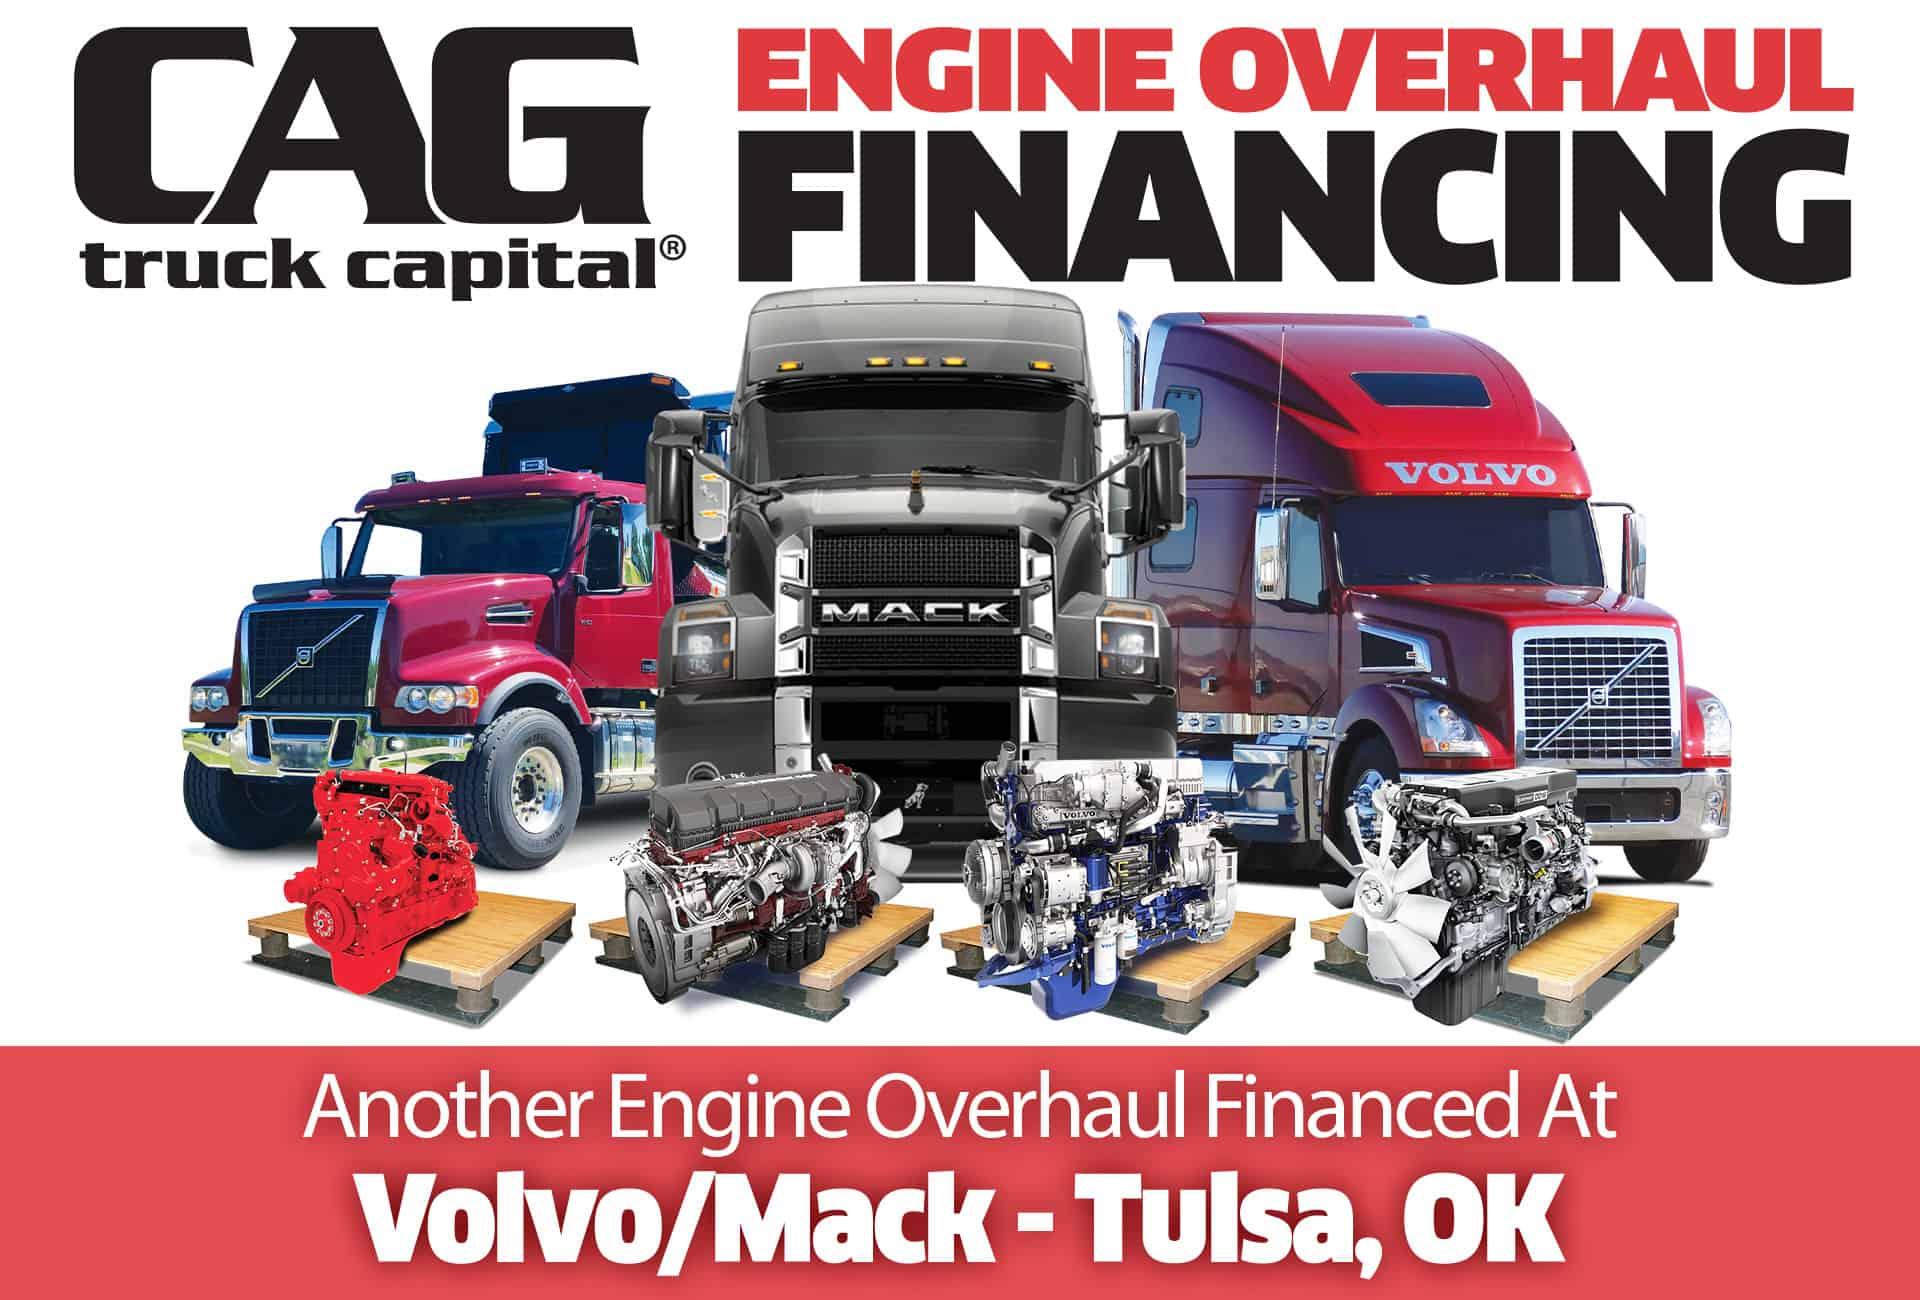 Volvo/Mack Engine Overhauls In Tulsa, OK